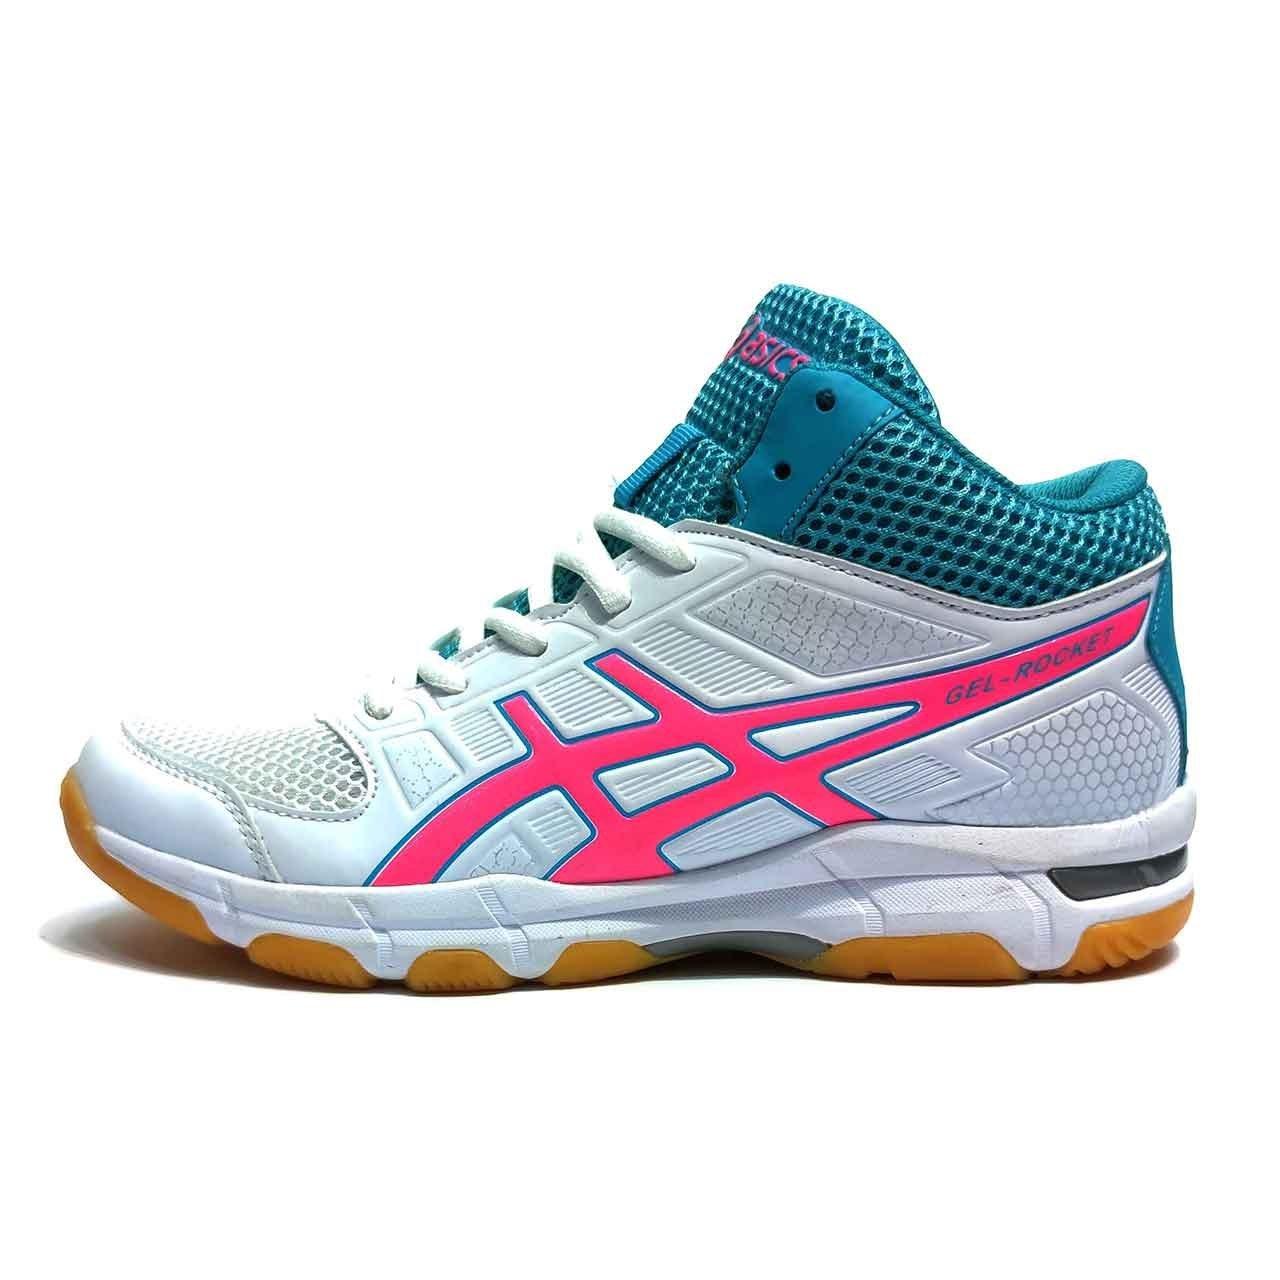 تصویر کفش والیبال آسیکس زنانه مدل  Asics GEL ROCKET 8MT